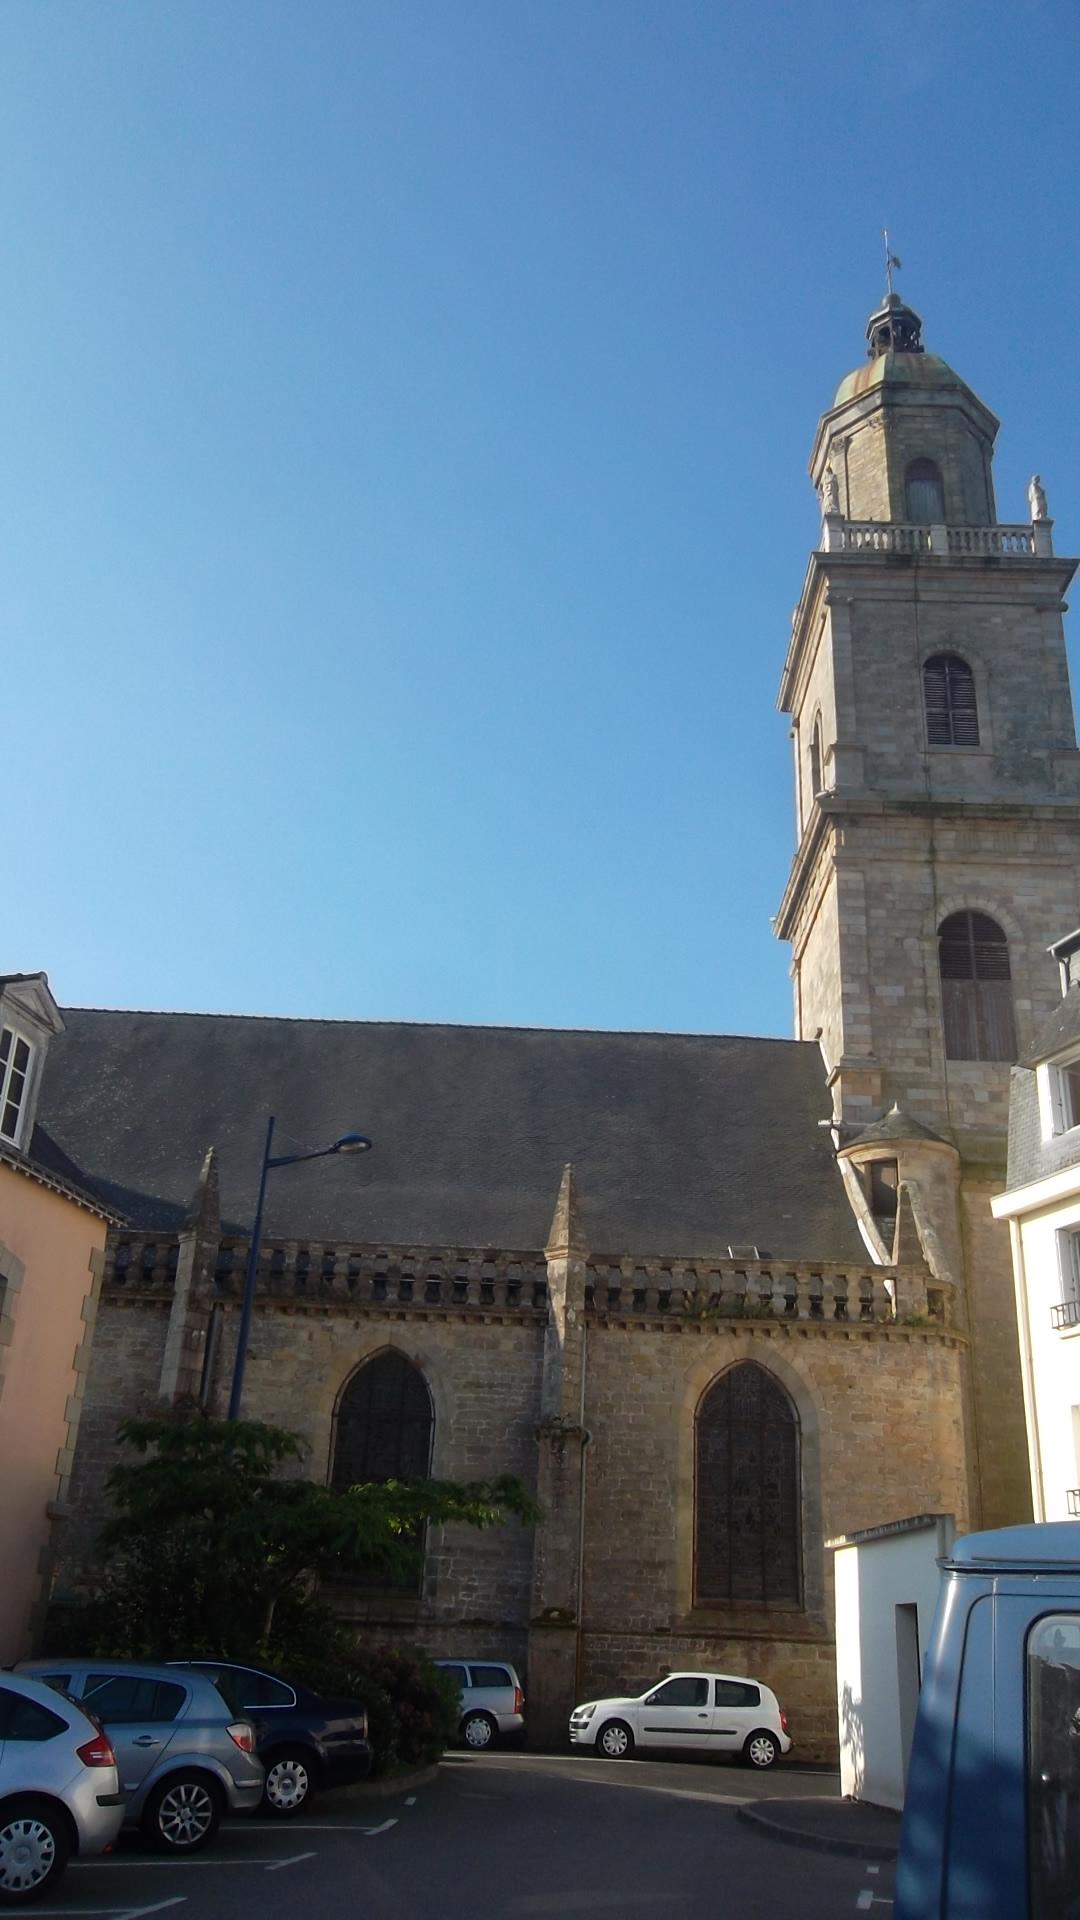 auray chapelle st helene hotel dieu side jul13